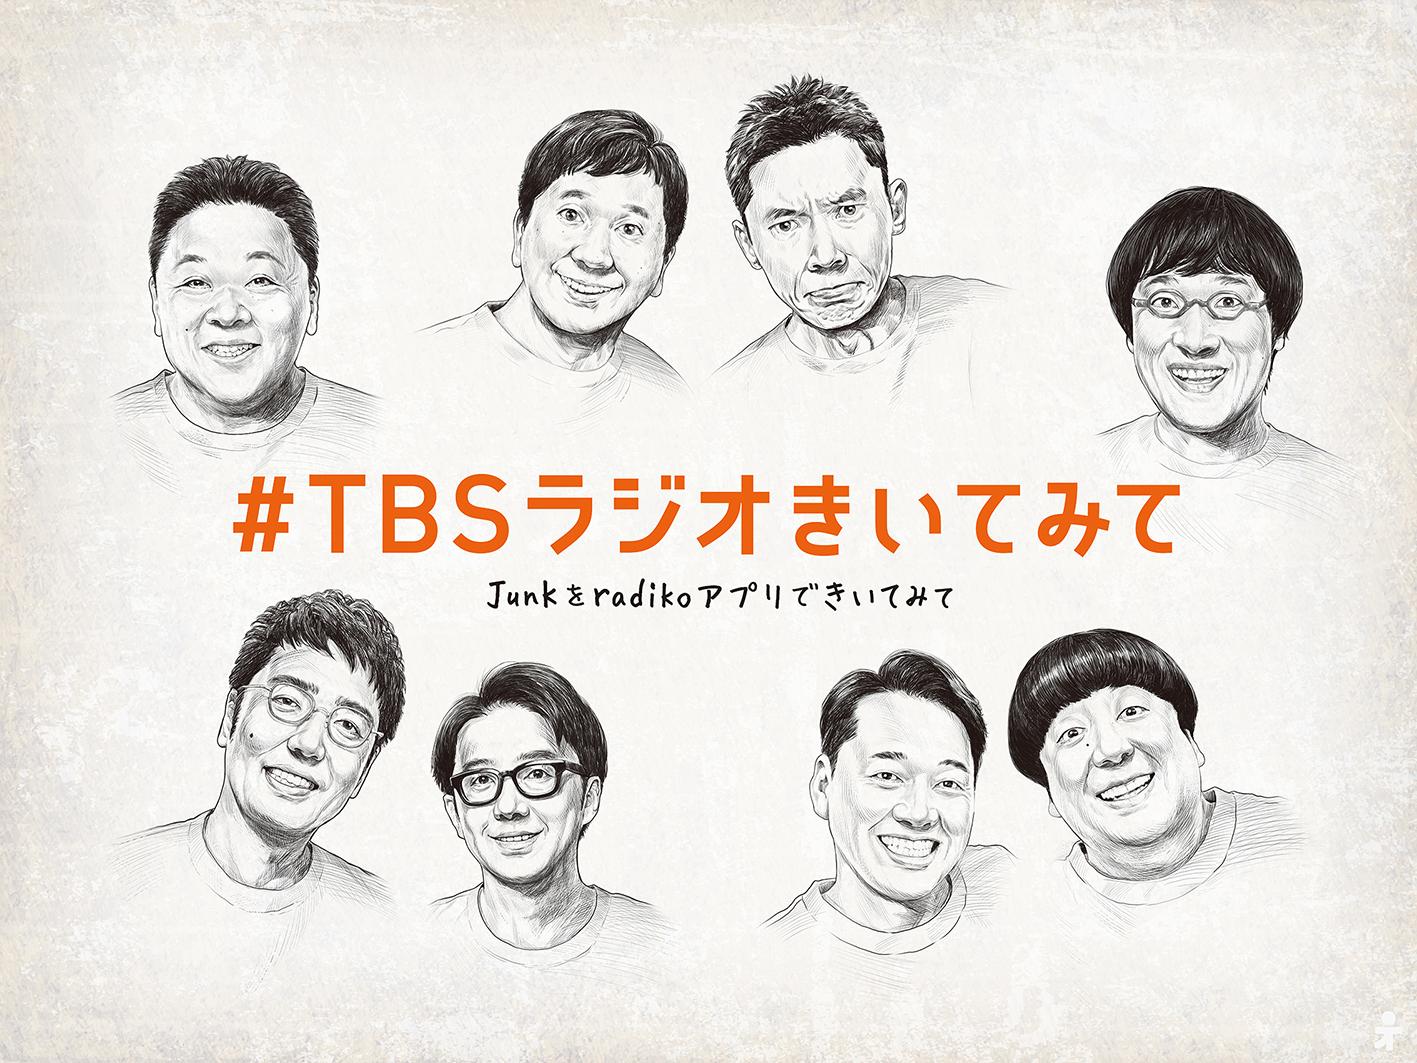 TBS RADIO / #TBSラジオきいてみて 広告キャンペーン1